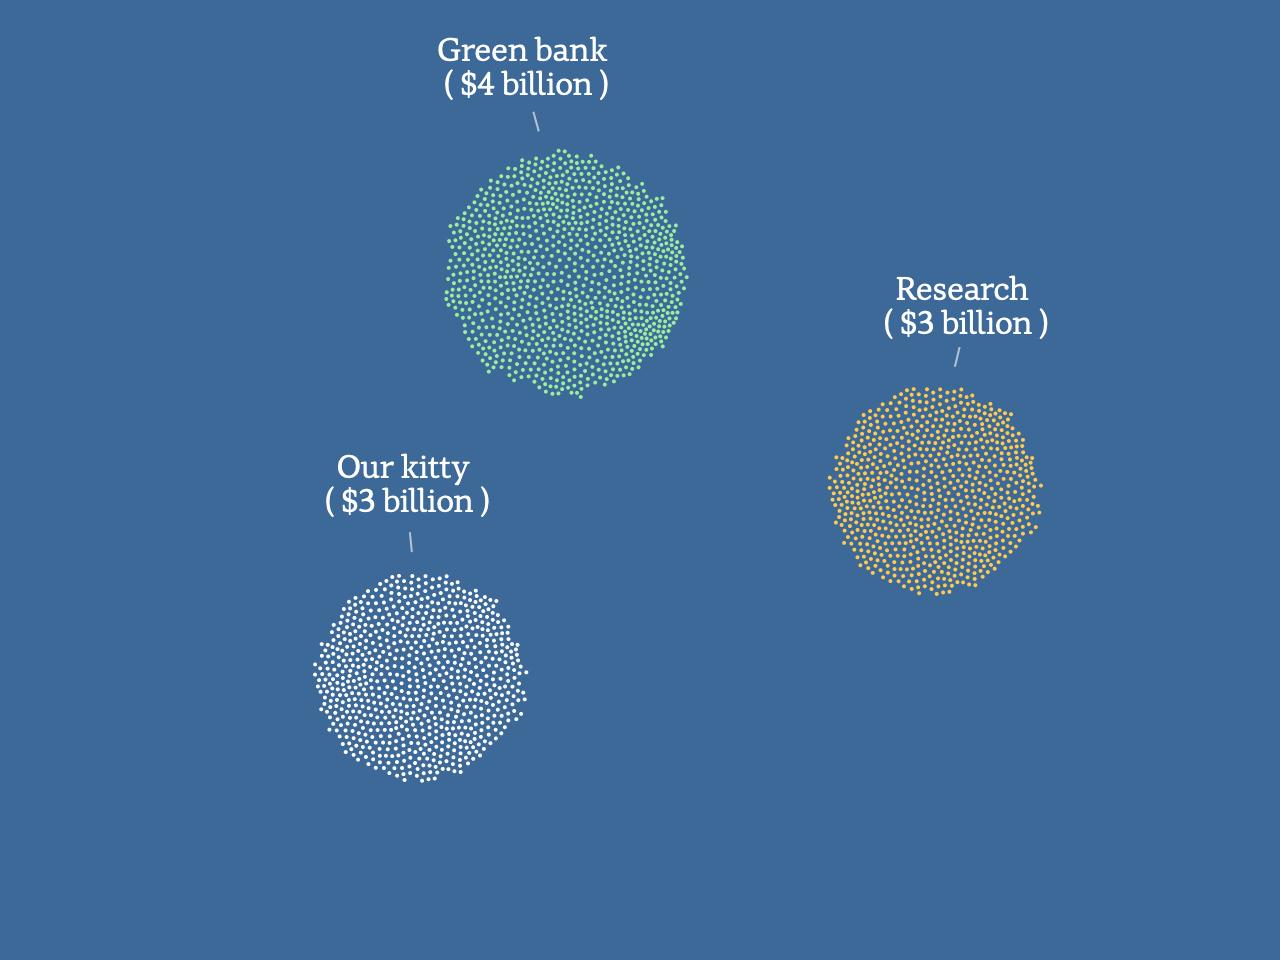 Our kitty: $3 billion, Green bank: $4 billion, Research: $3 billion